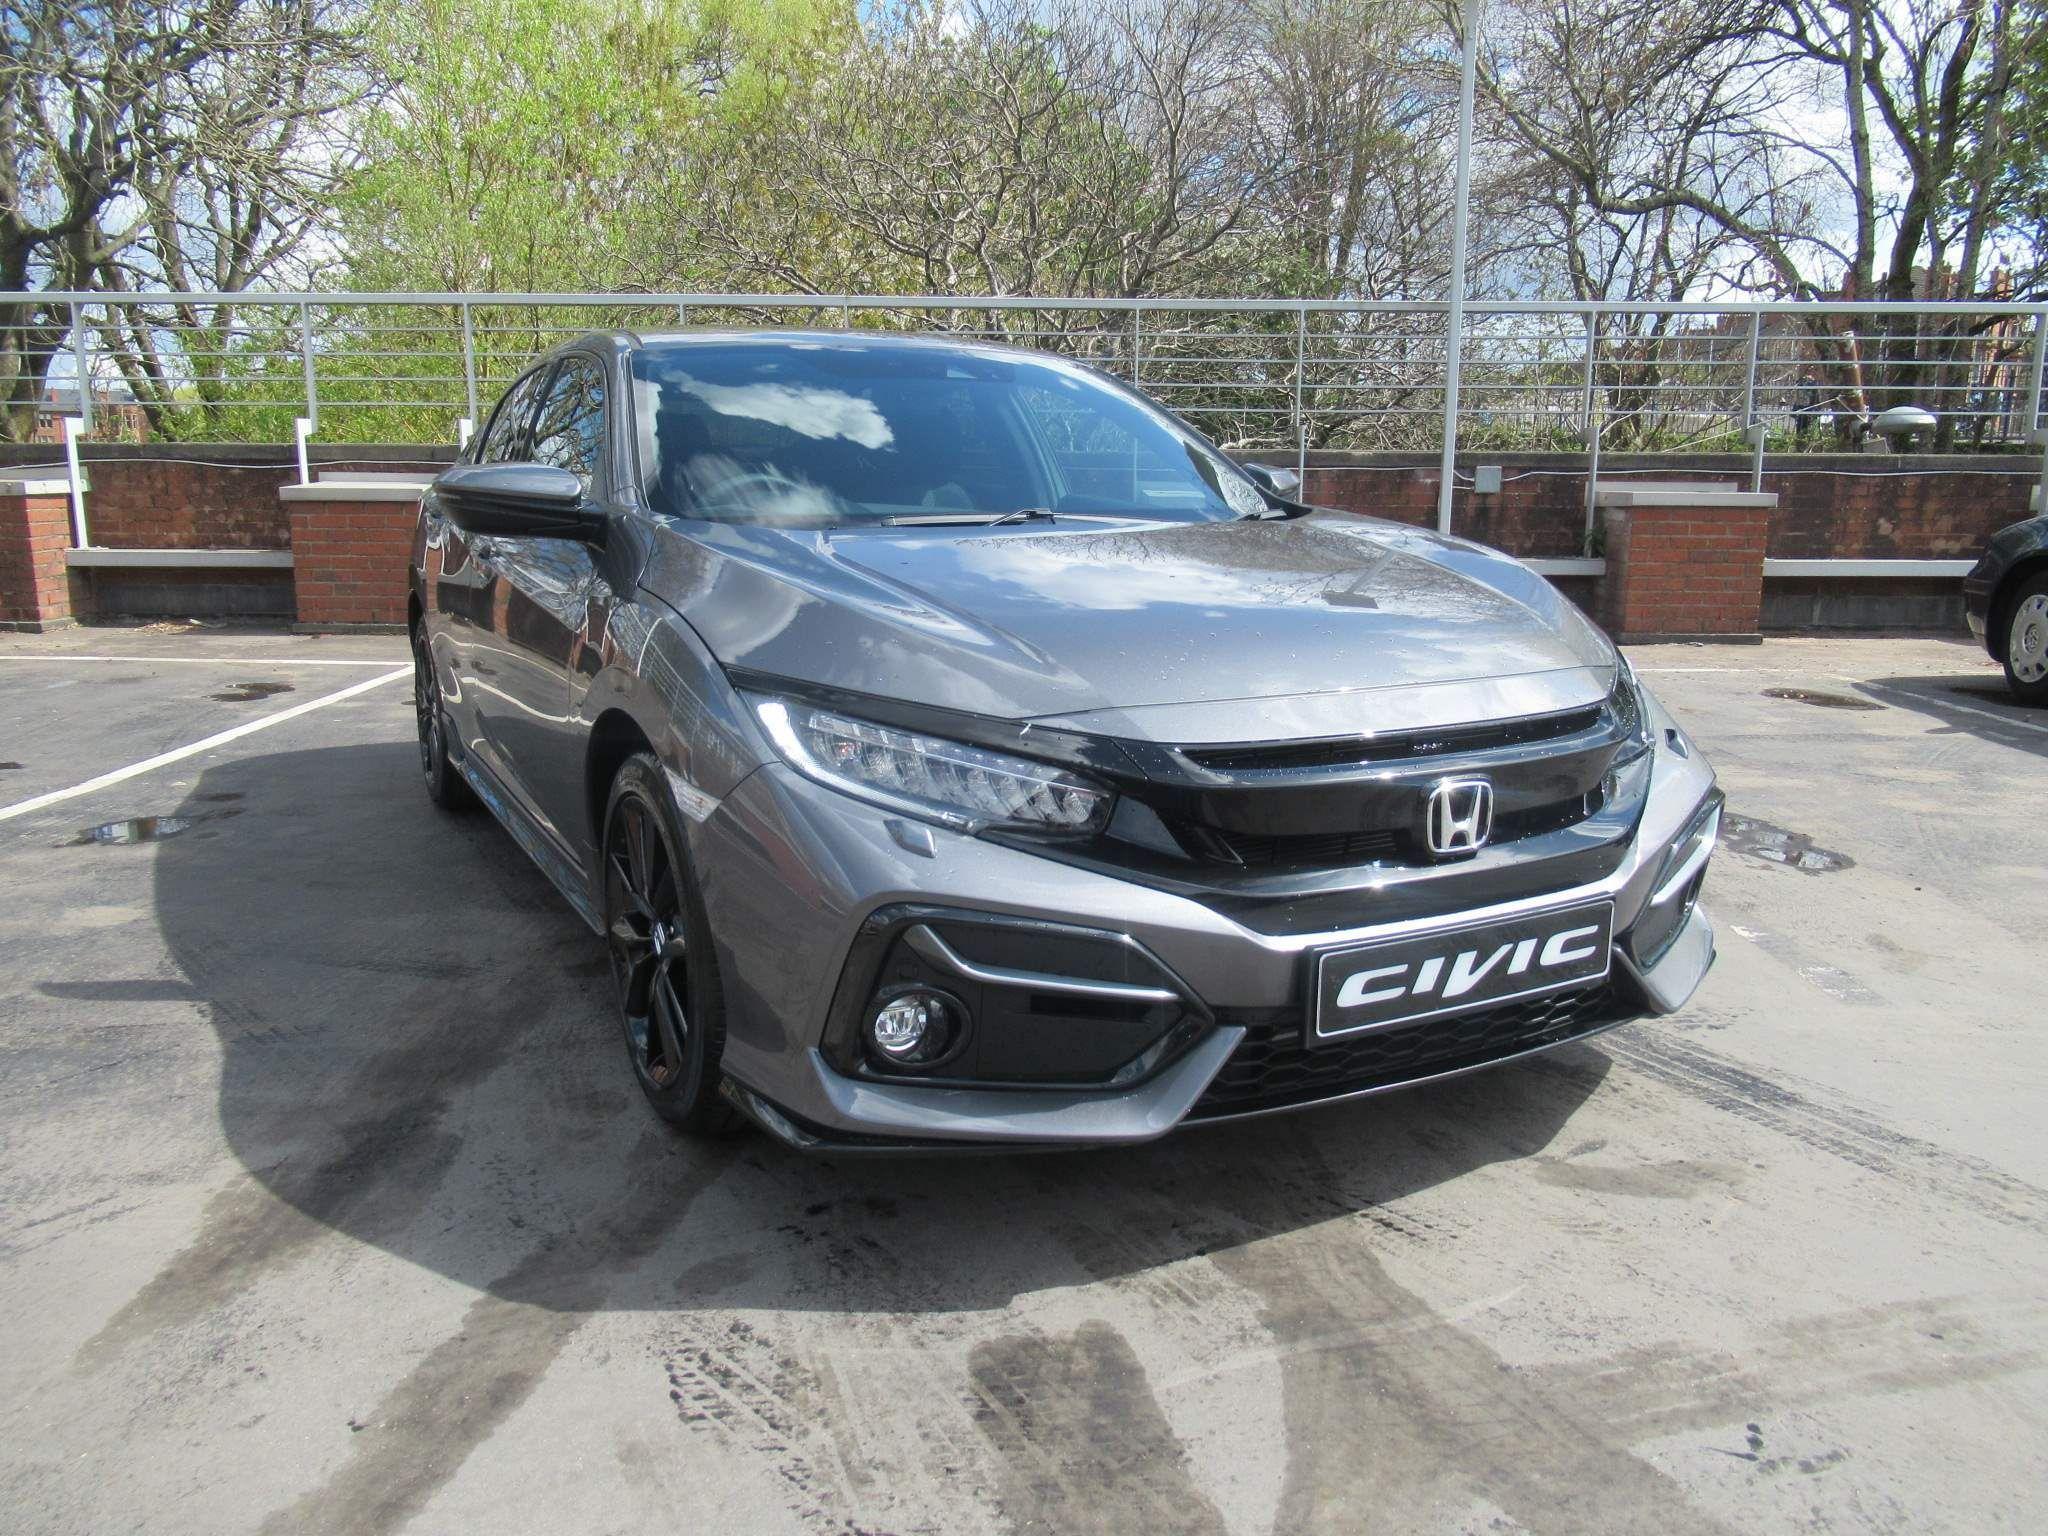 Honda Civic 1.5 VTEC Turbo Sport (s/s) 5dr